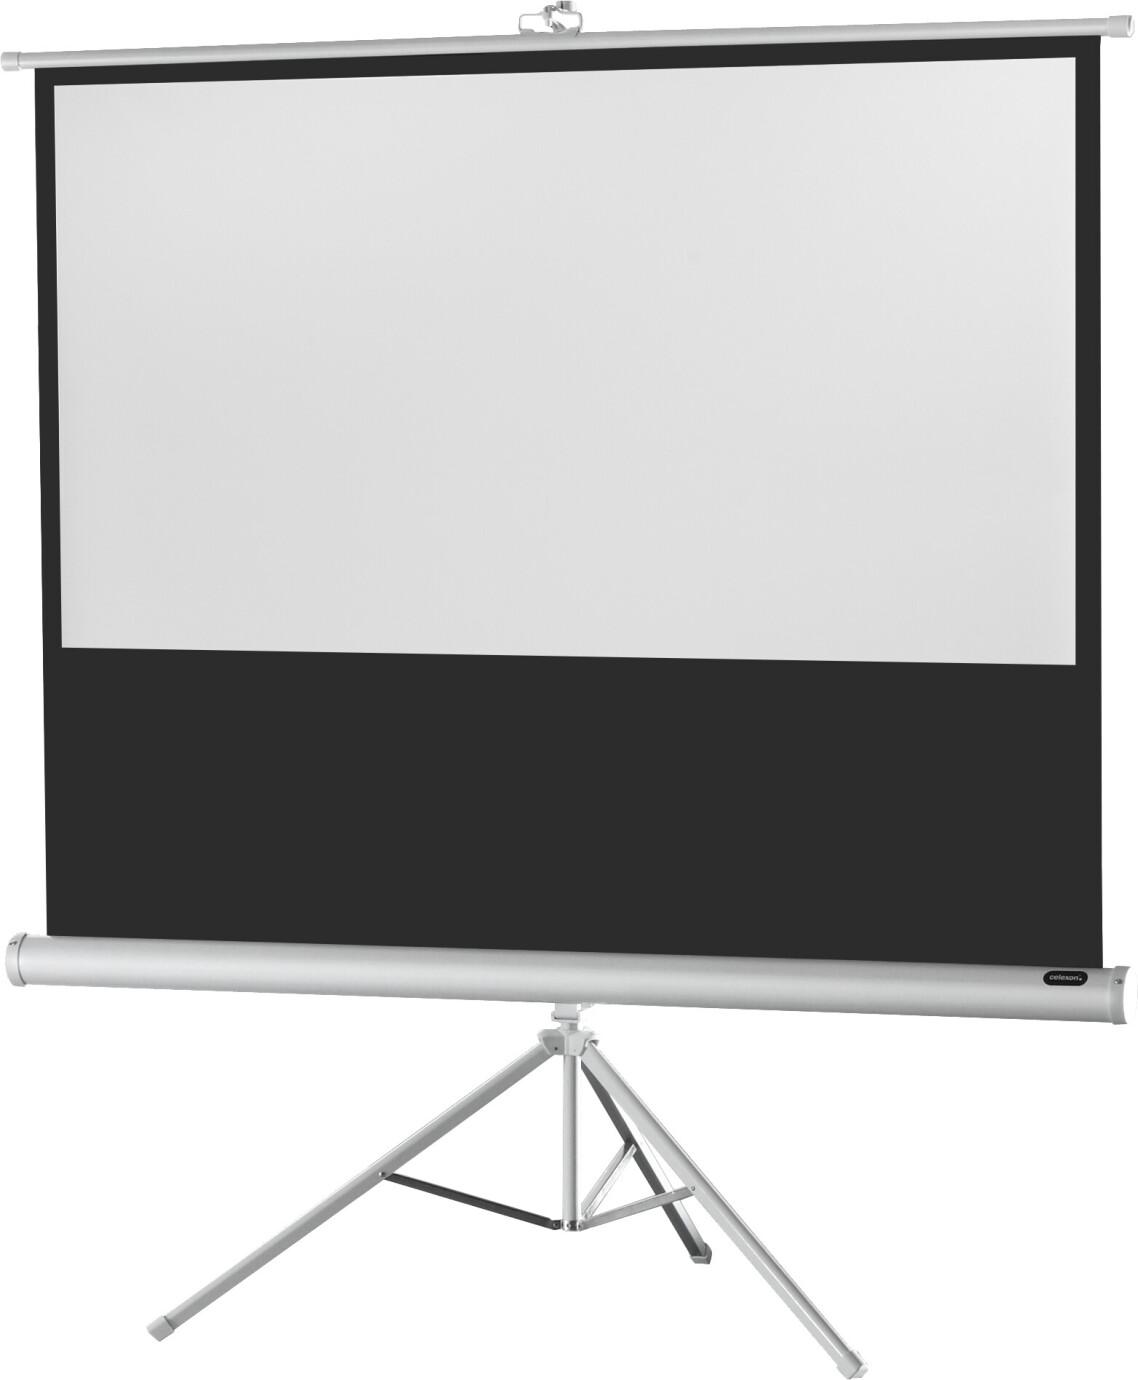 celexon Stativleinwand Economy 244 x 138 cm - White Edition